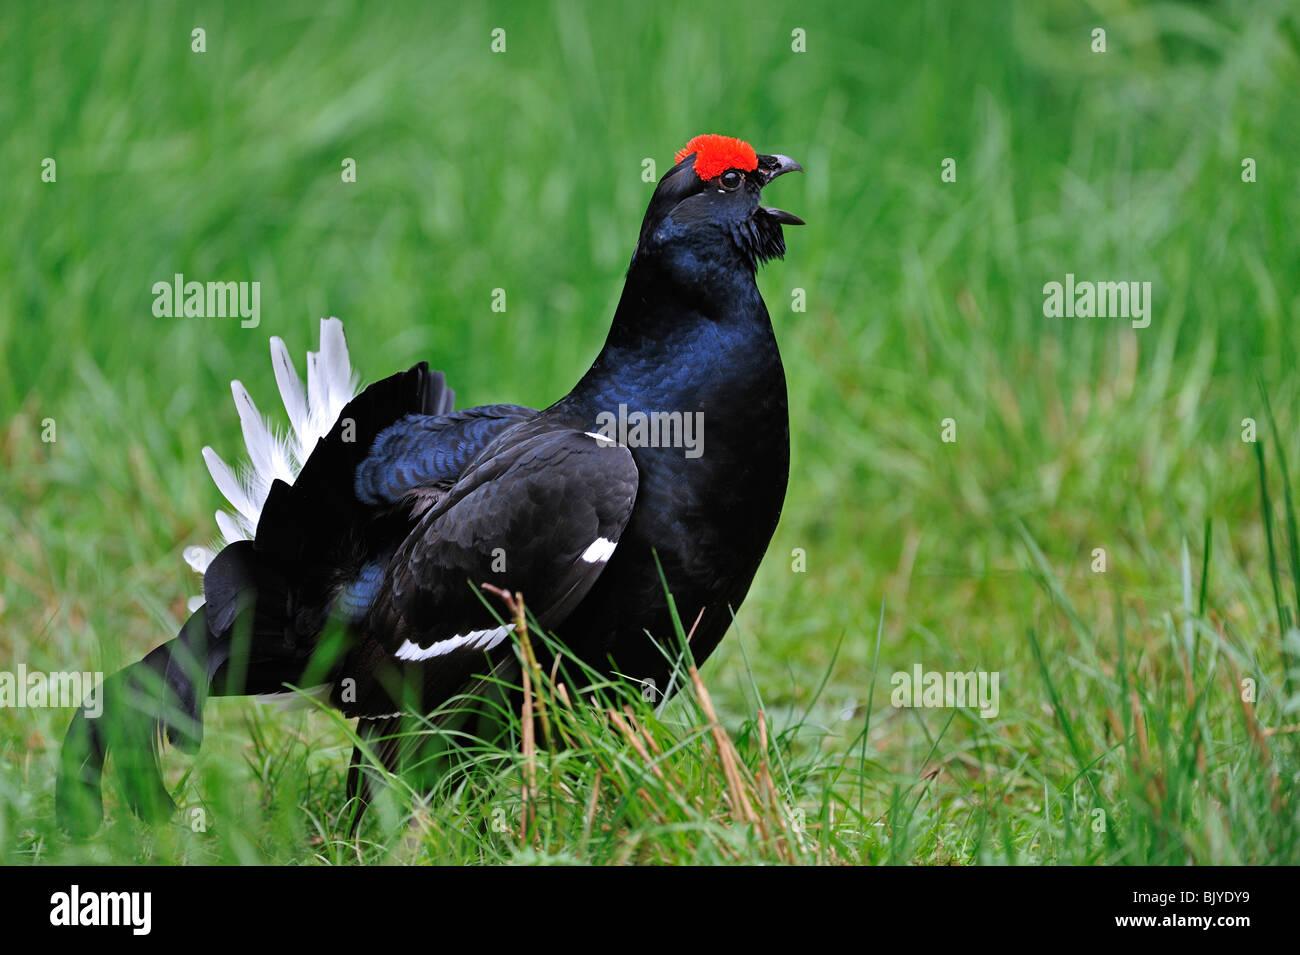 Black grouse (Lyrurus tetrix / Tetrao tetrix) male calling - Stock Image